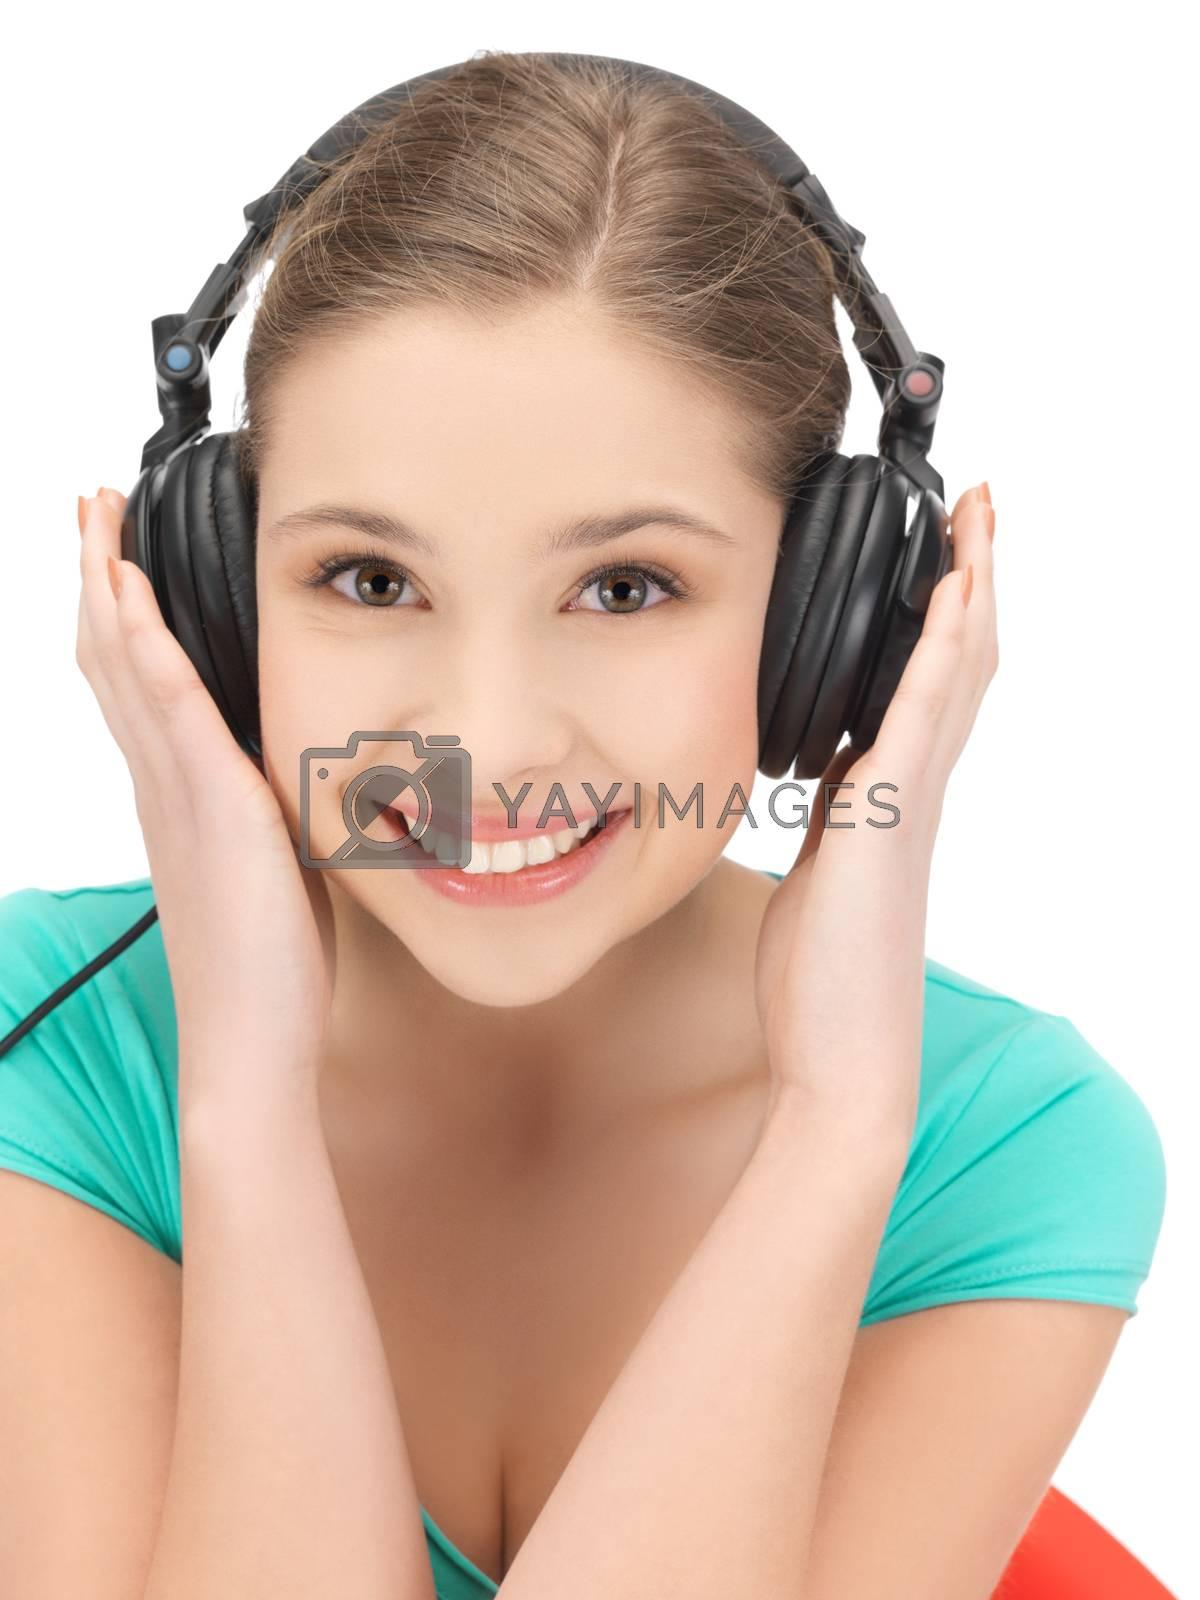 girl with headphones by dolgachov